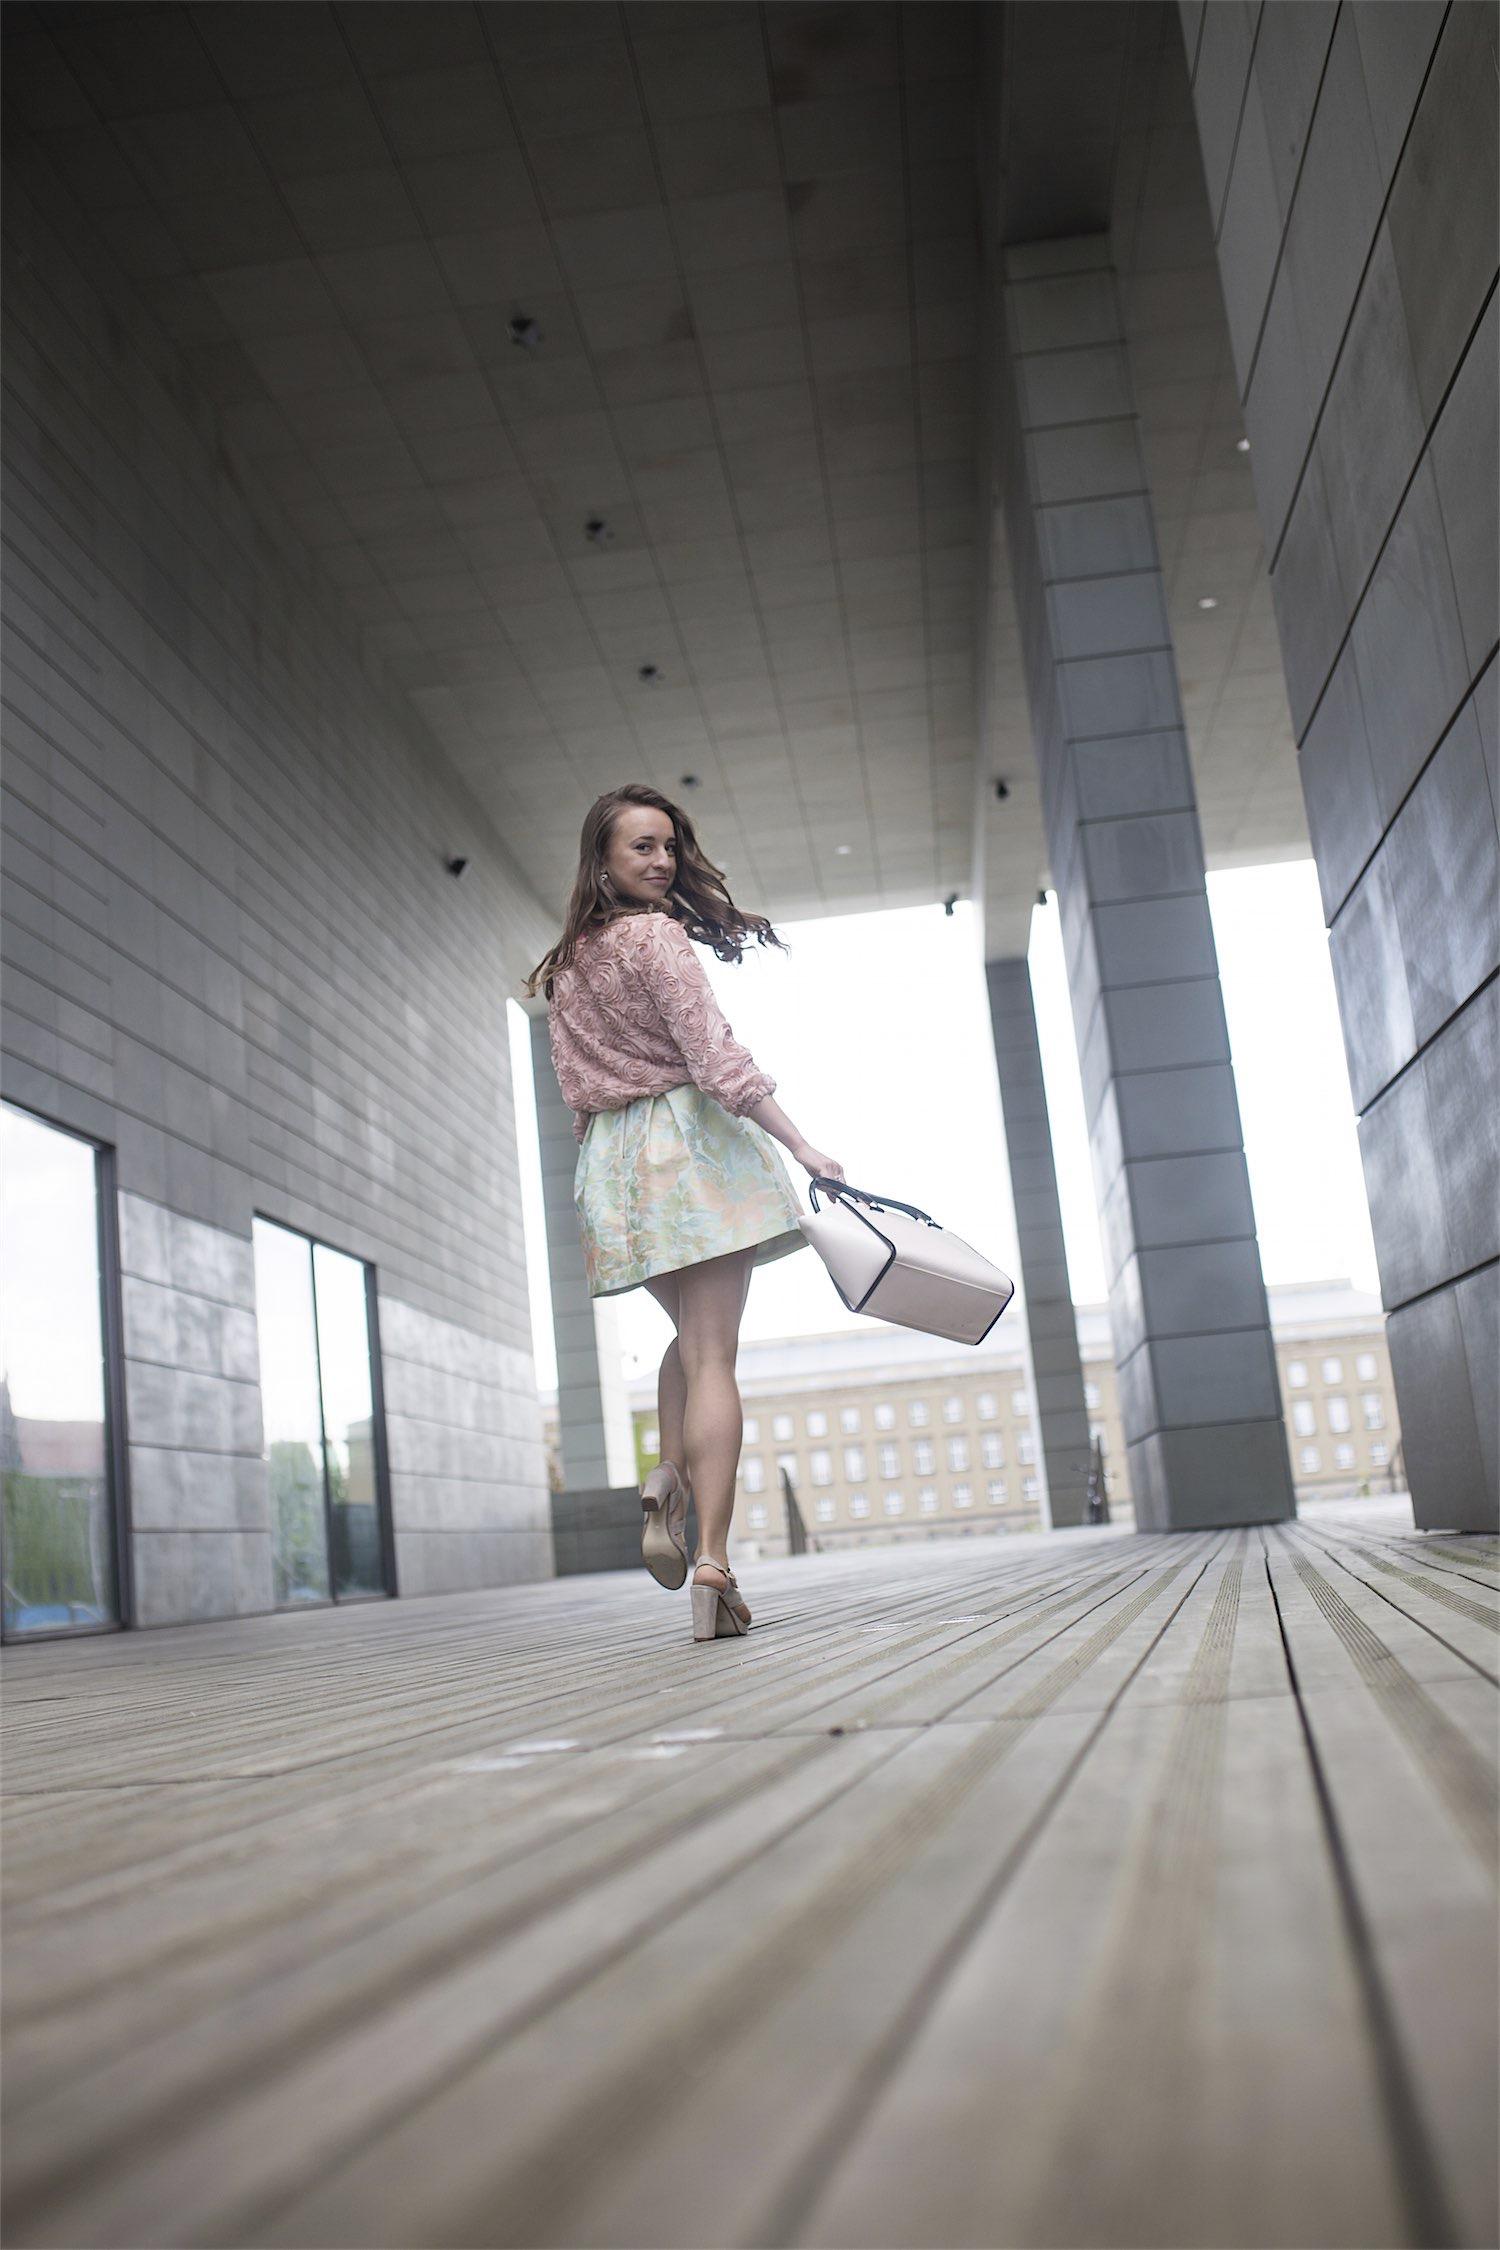 fashion-blogger-kateillustrate-tedbaker-skirt10